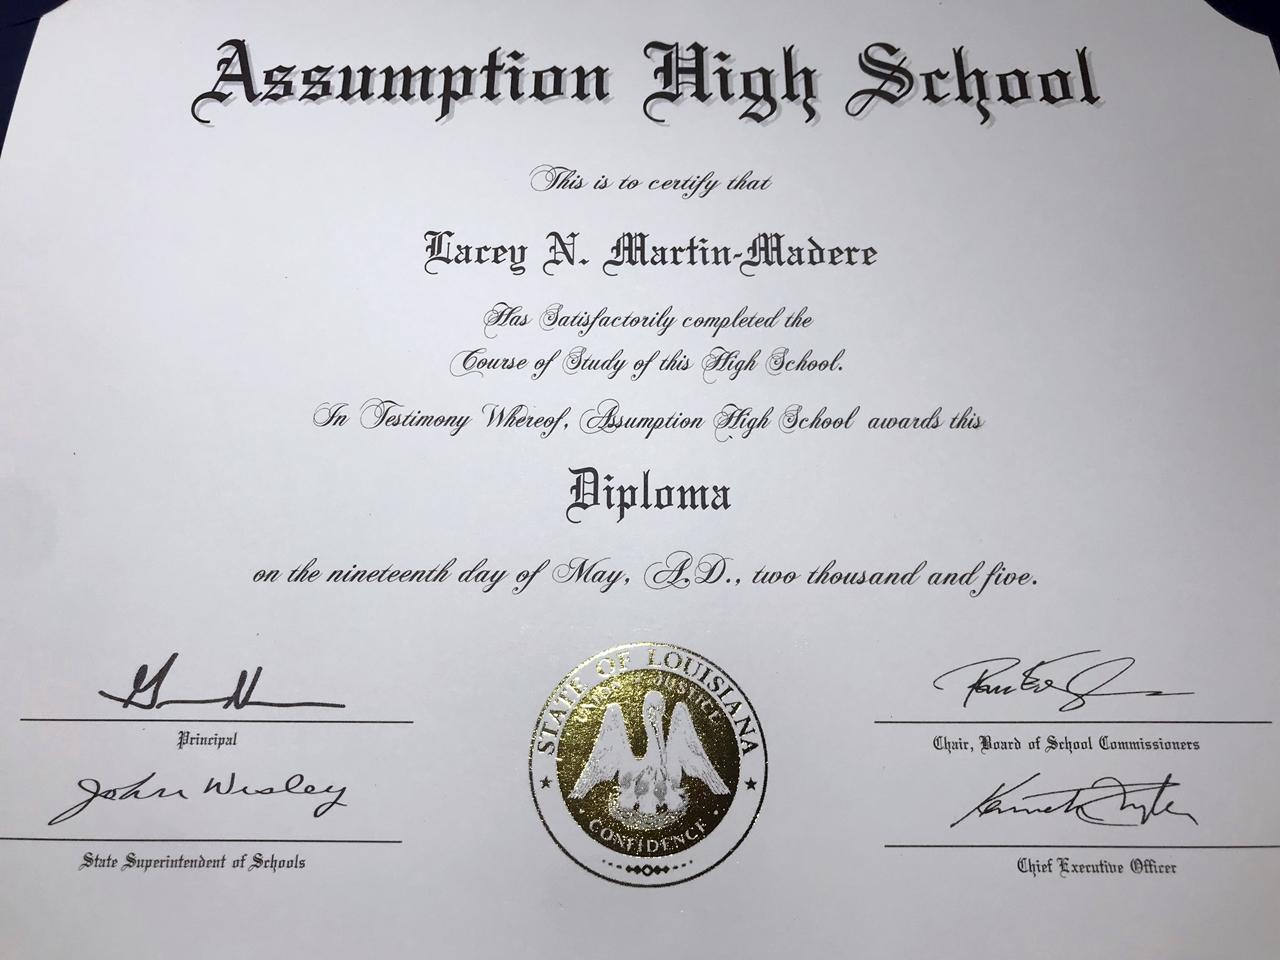 Replica high school diploma